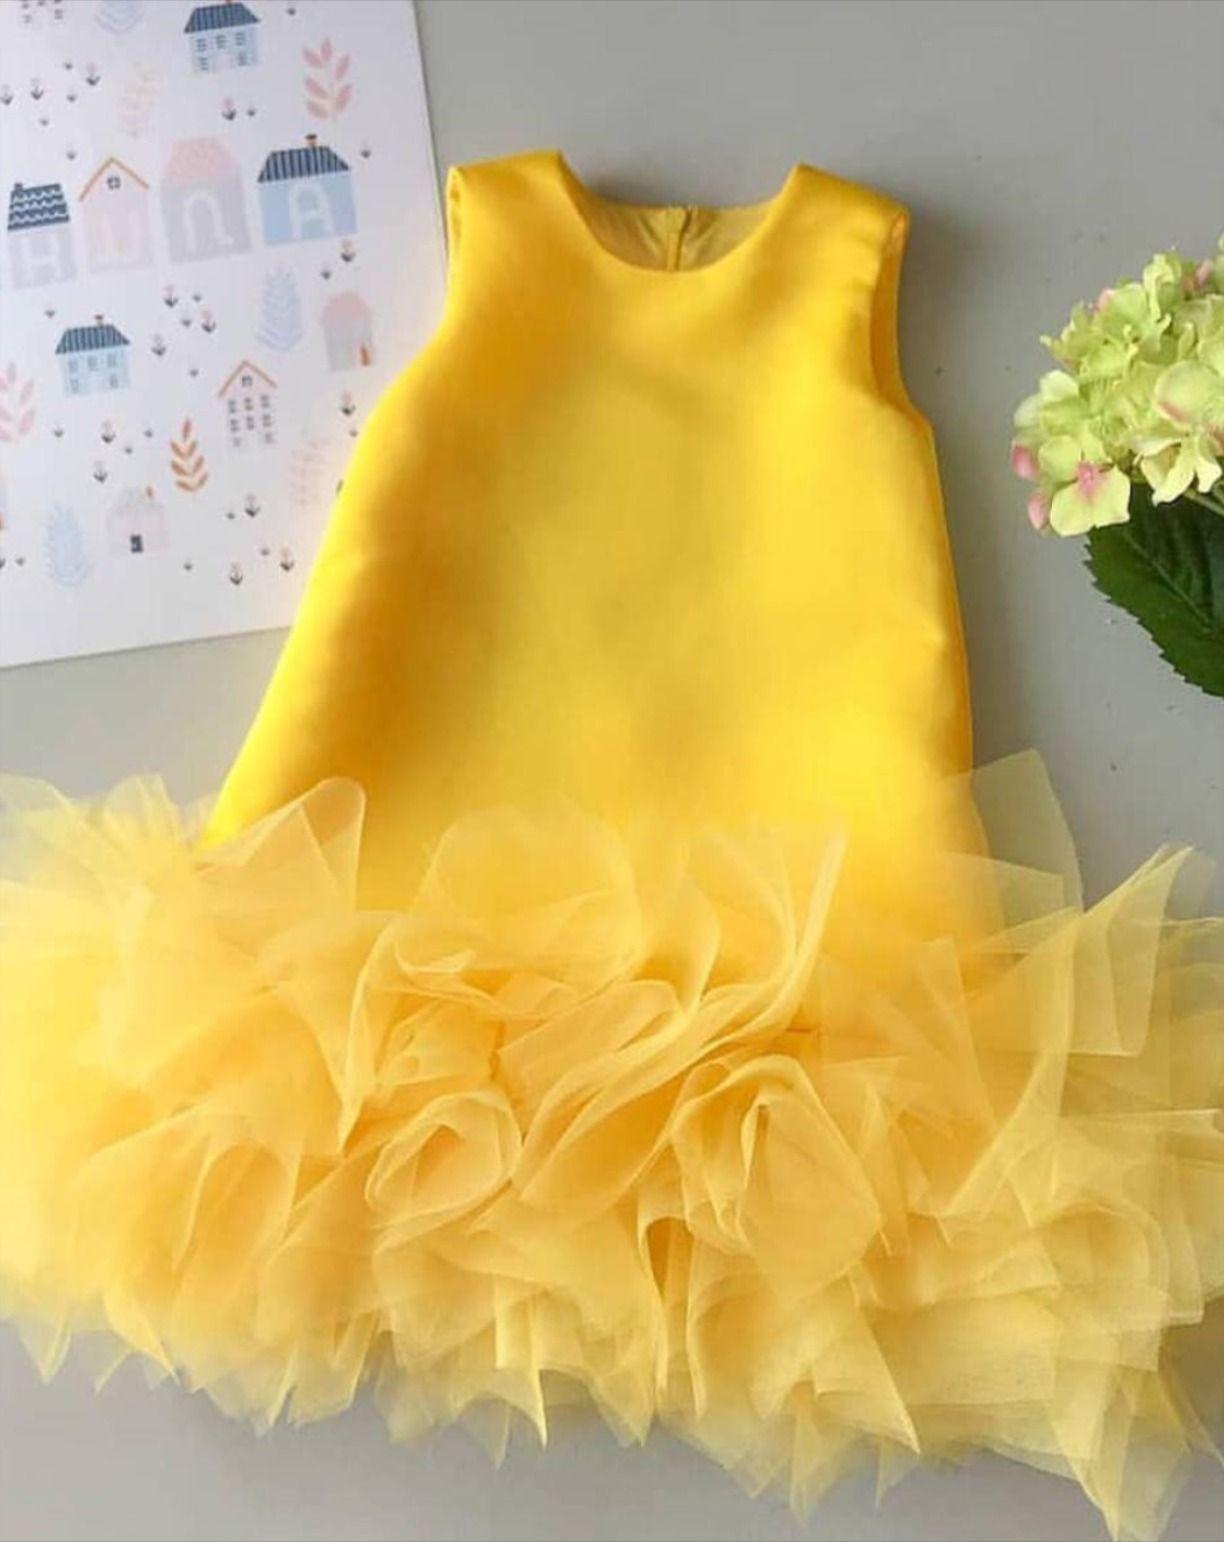 Children Dresses Birthday Dresses Flowergirl Dresses Children Clothing Couture Dresses Fashion Dresses Dresses Little Girl Dresses Kids Outfits Girls Dresses